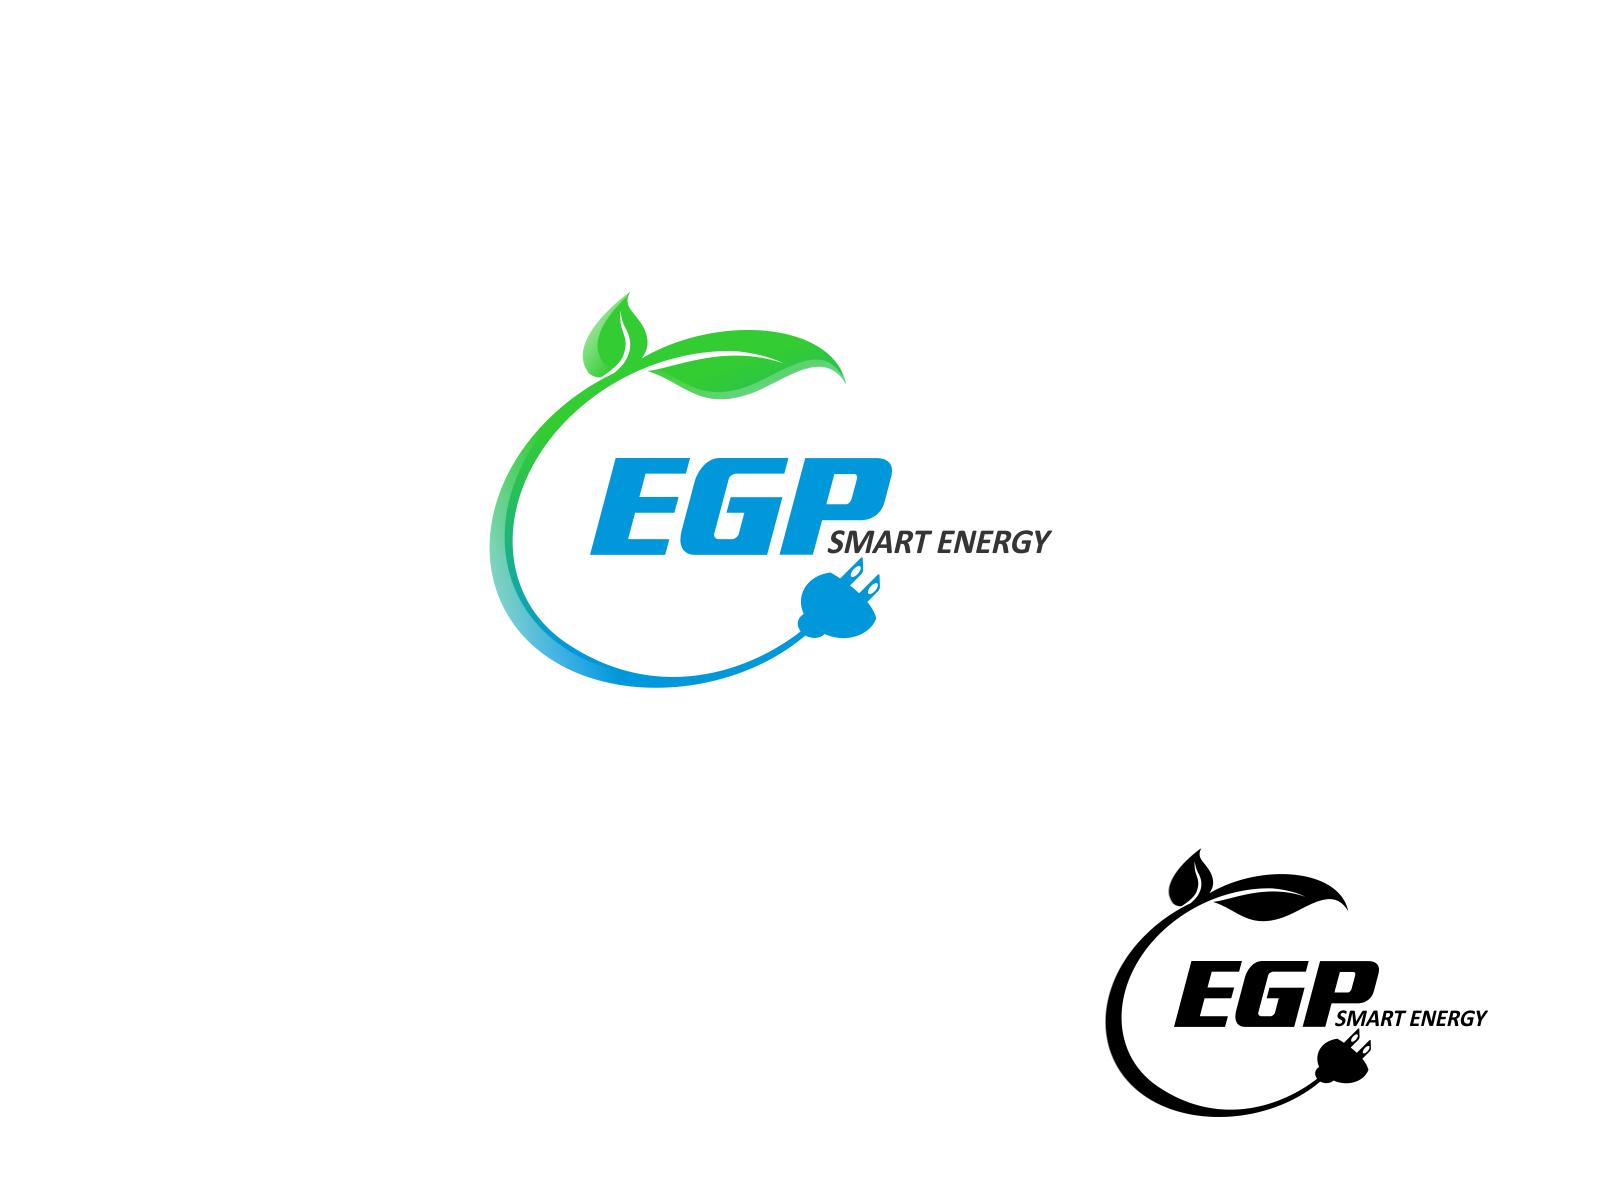 Logo Design by Chris Frederickson - Entry No. 7 in the Logo Design Contest Captivating Logo Design for EGP Smart Energy.